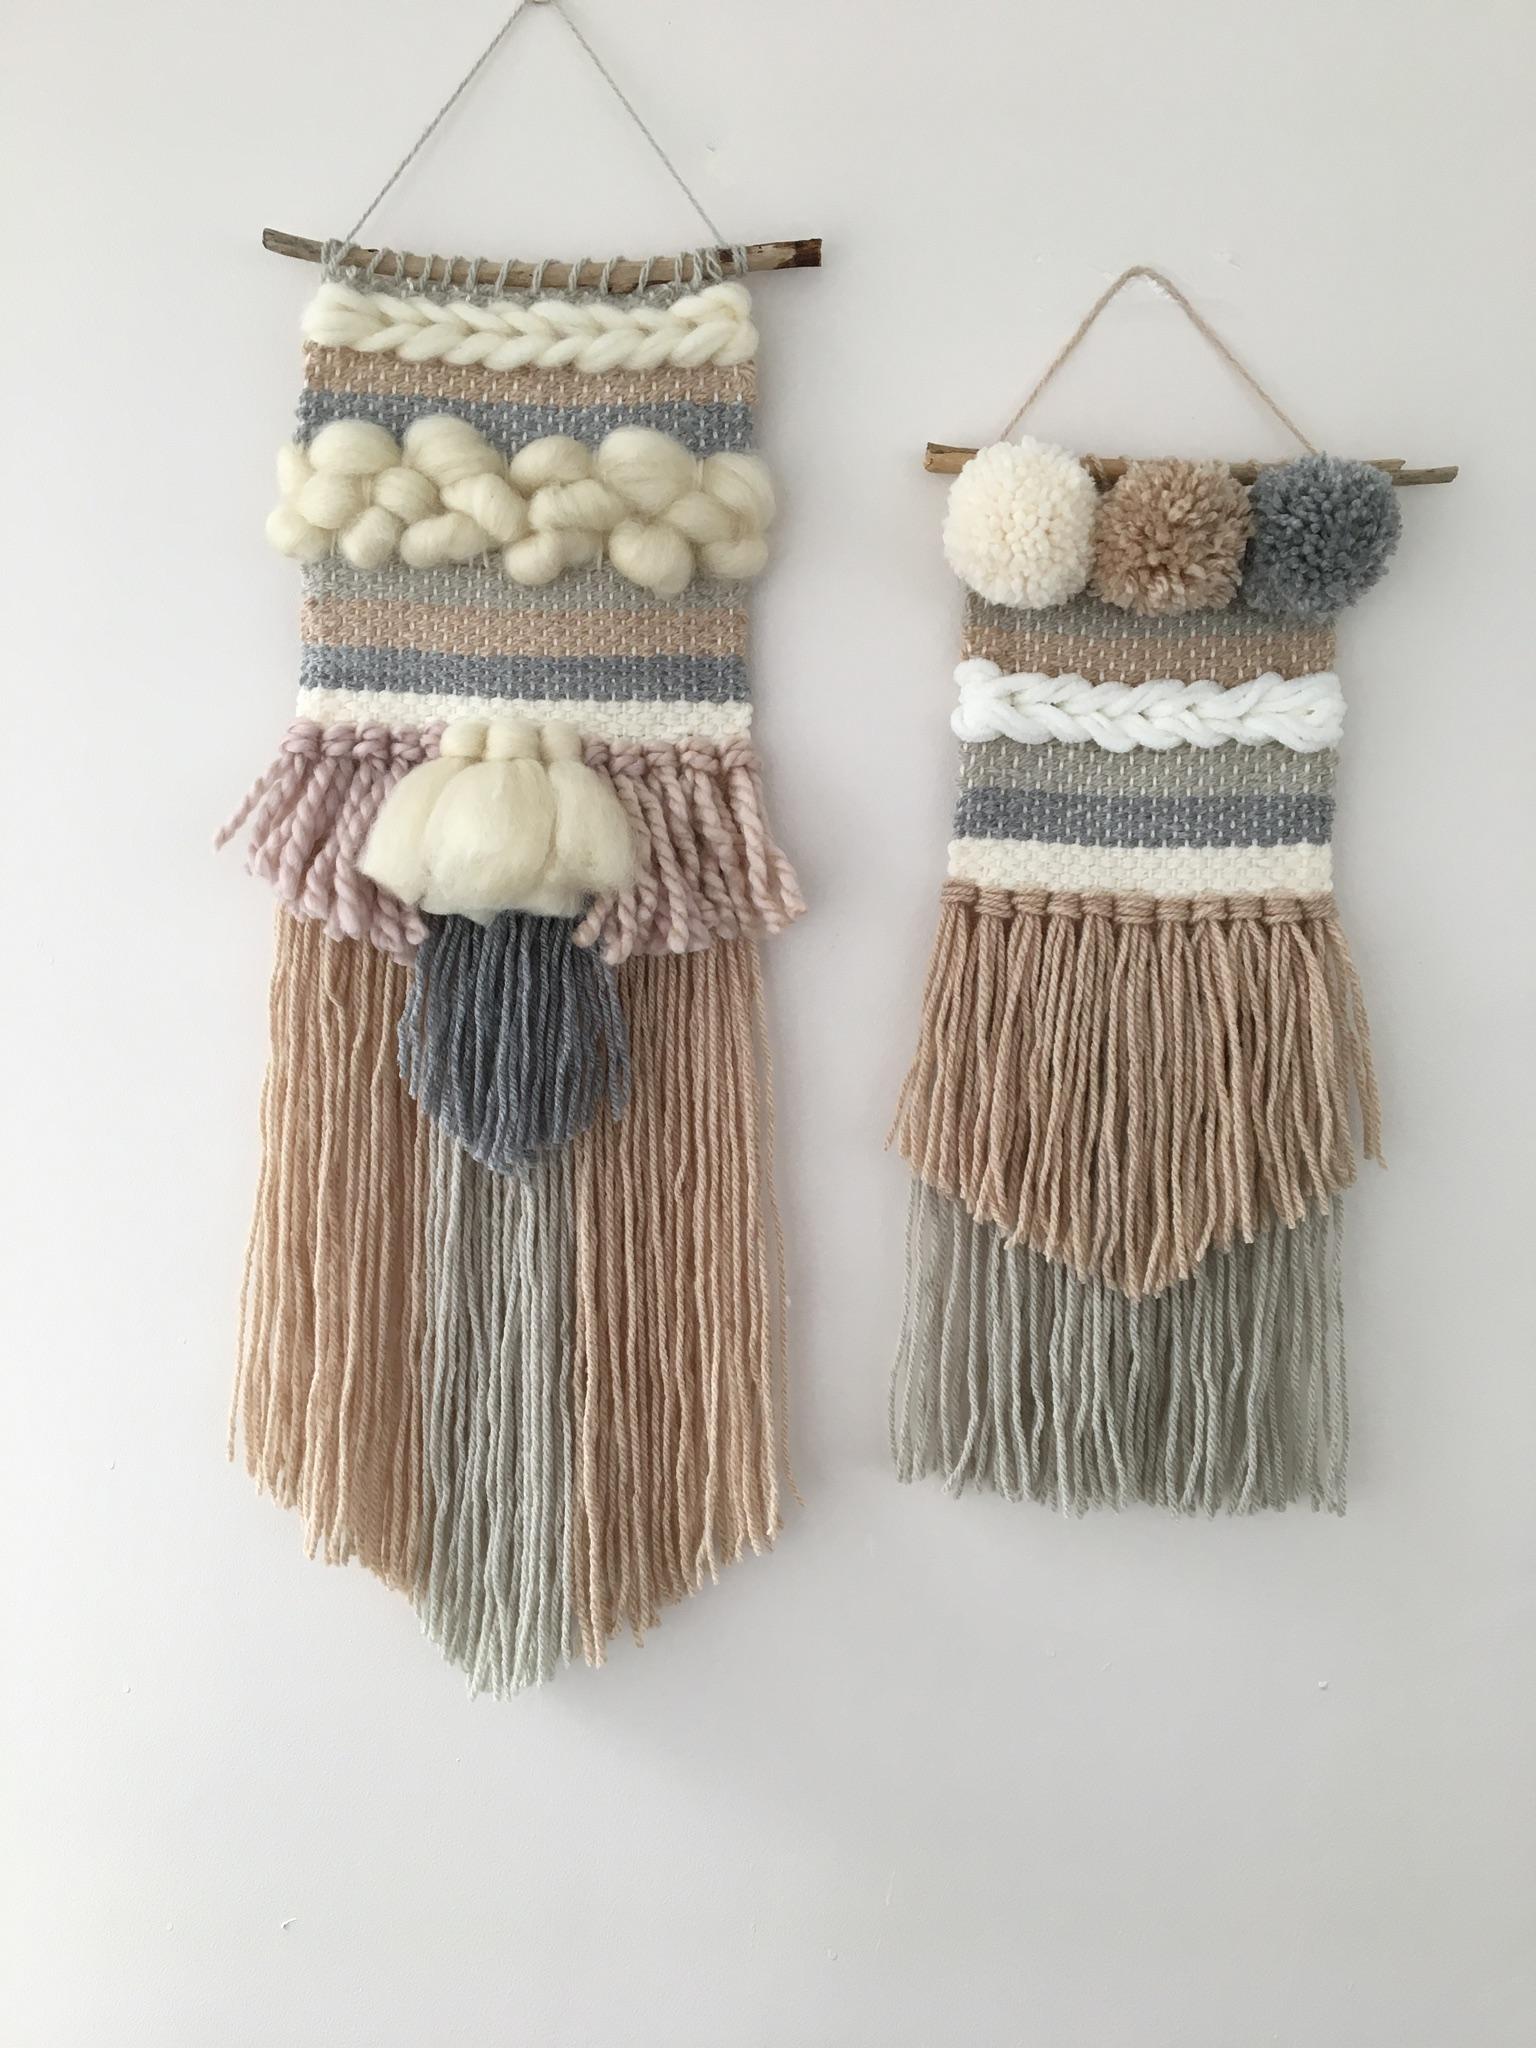 Natasha weaving 1.jpg